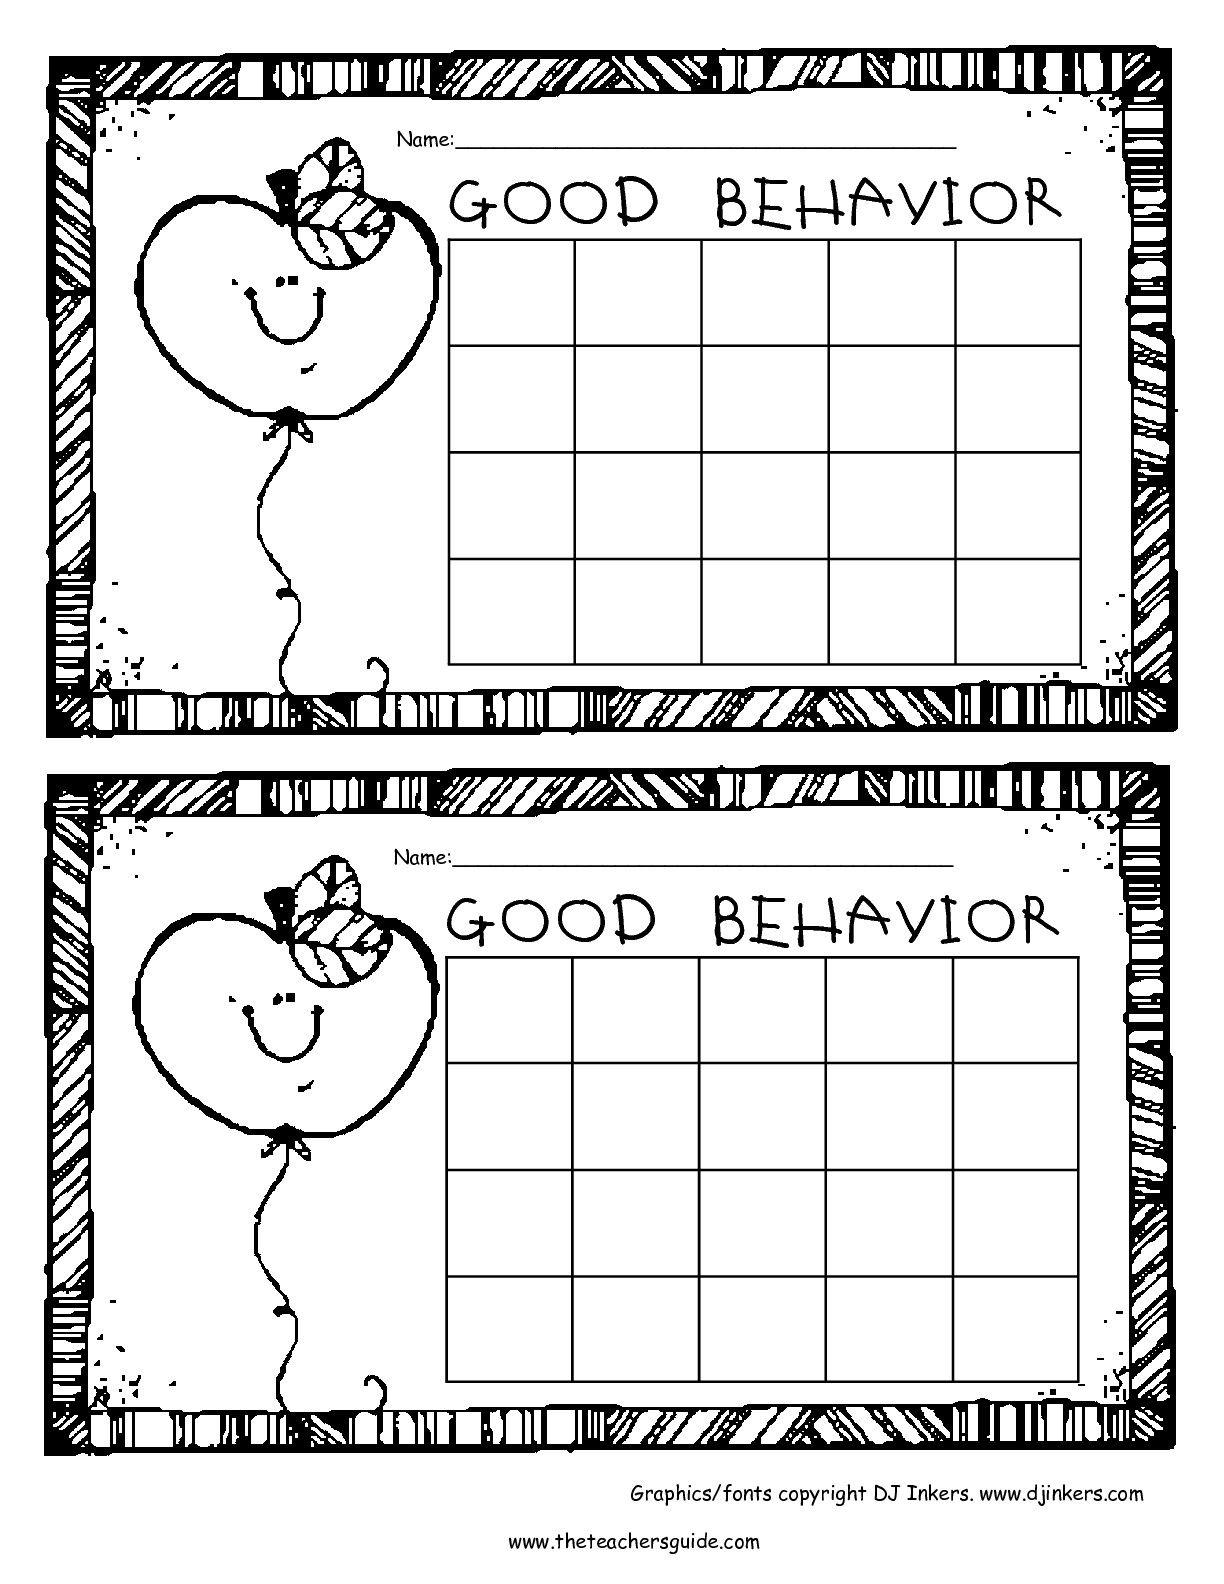 Free Printable Reward And Incentive Charts | Rewards | Free throughout Free Printable Behavior Charts For Kindergarten